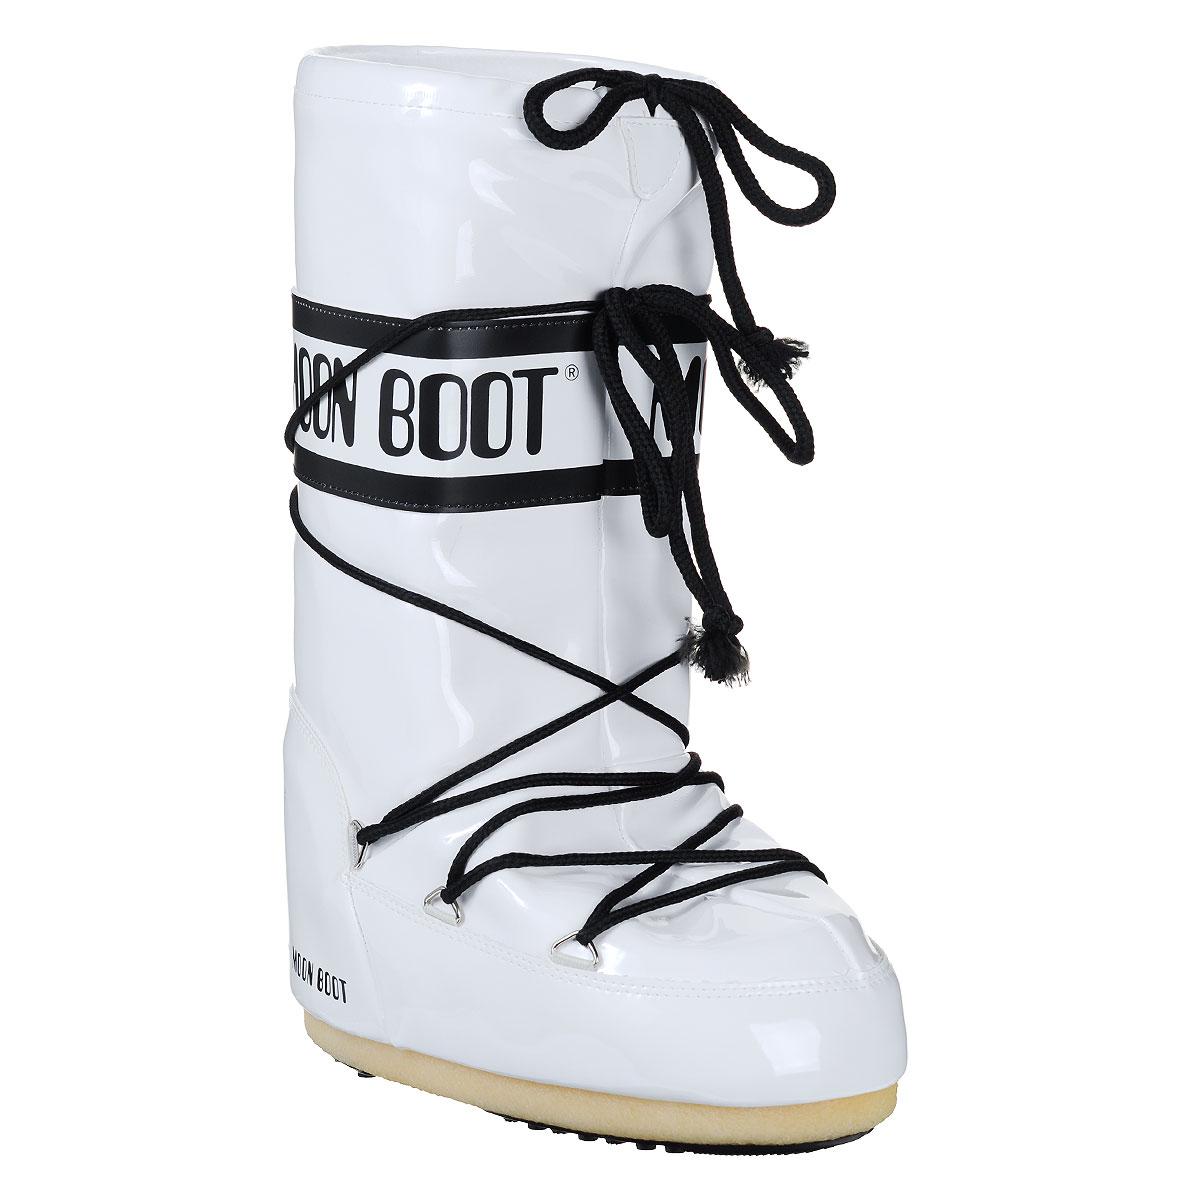 �������� ������� Moon Boot Vinil. 14009700 - Tecnica - Tecnica14009700_001����������� �������� Tecnica Moon Boot Vinil ��������� �� ����������� � ���������������� � ��������� �����������, � ����� ������� ������������ ���������. ������-�������� ����� 2 ����� - ������� � ���������� �����-����� (���������� ���������). ������� ��������� ������� ������������ ����������. �������� ������ �������� � ��������� ������. �������� ����� ���������, ������ � �������������.